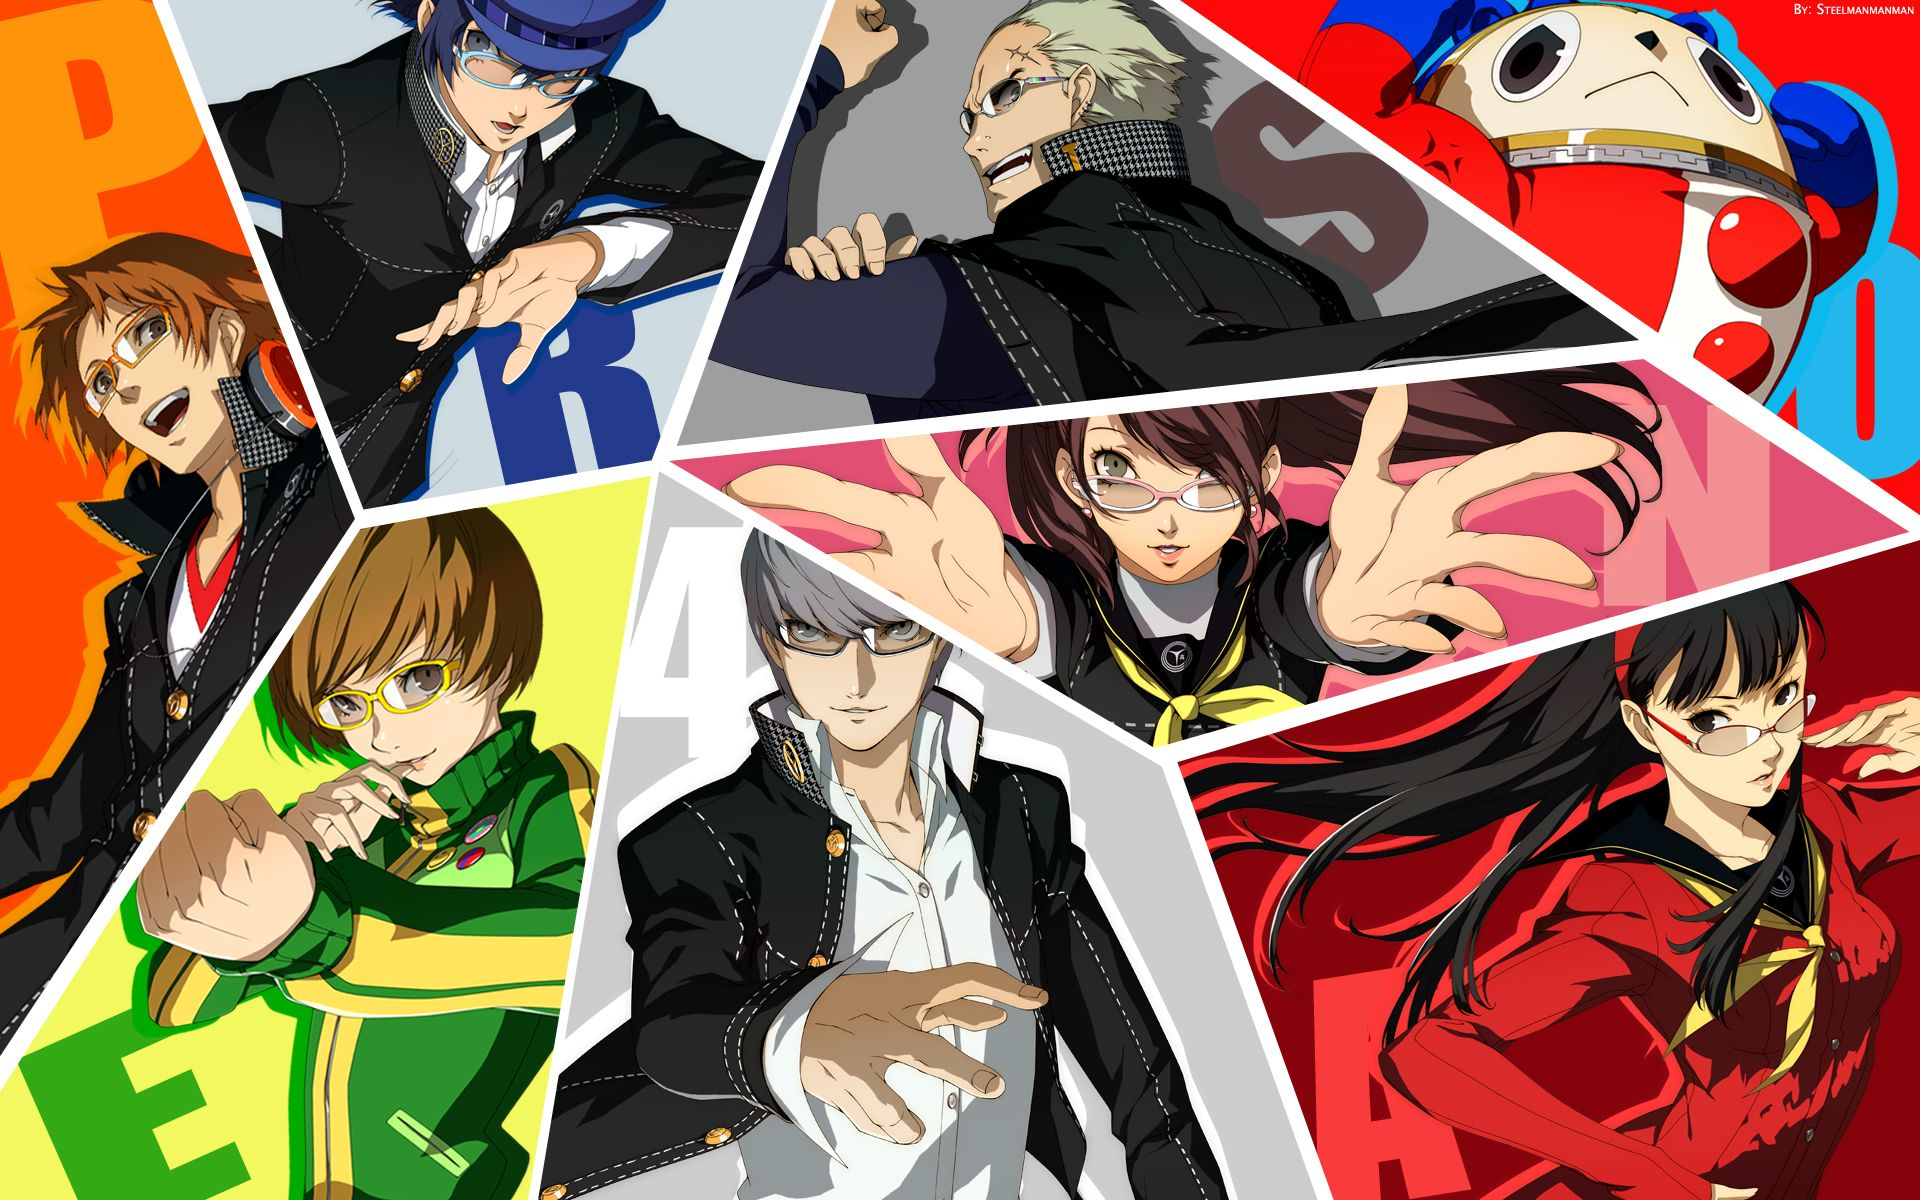 [Top 10] Animes que Merecem vir pro Brasil Dublados 0a7547813dcbcd8e9c28b38e142802de